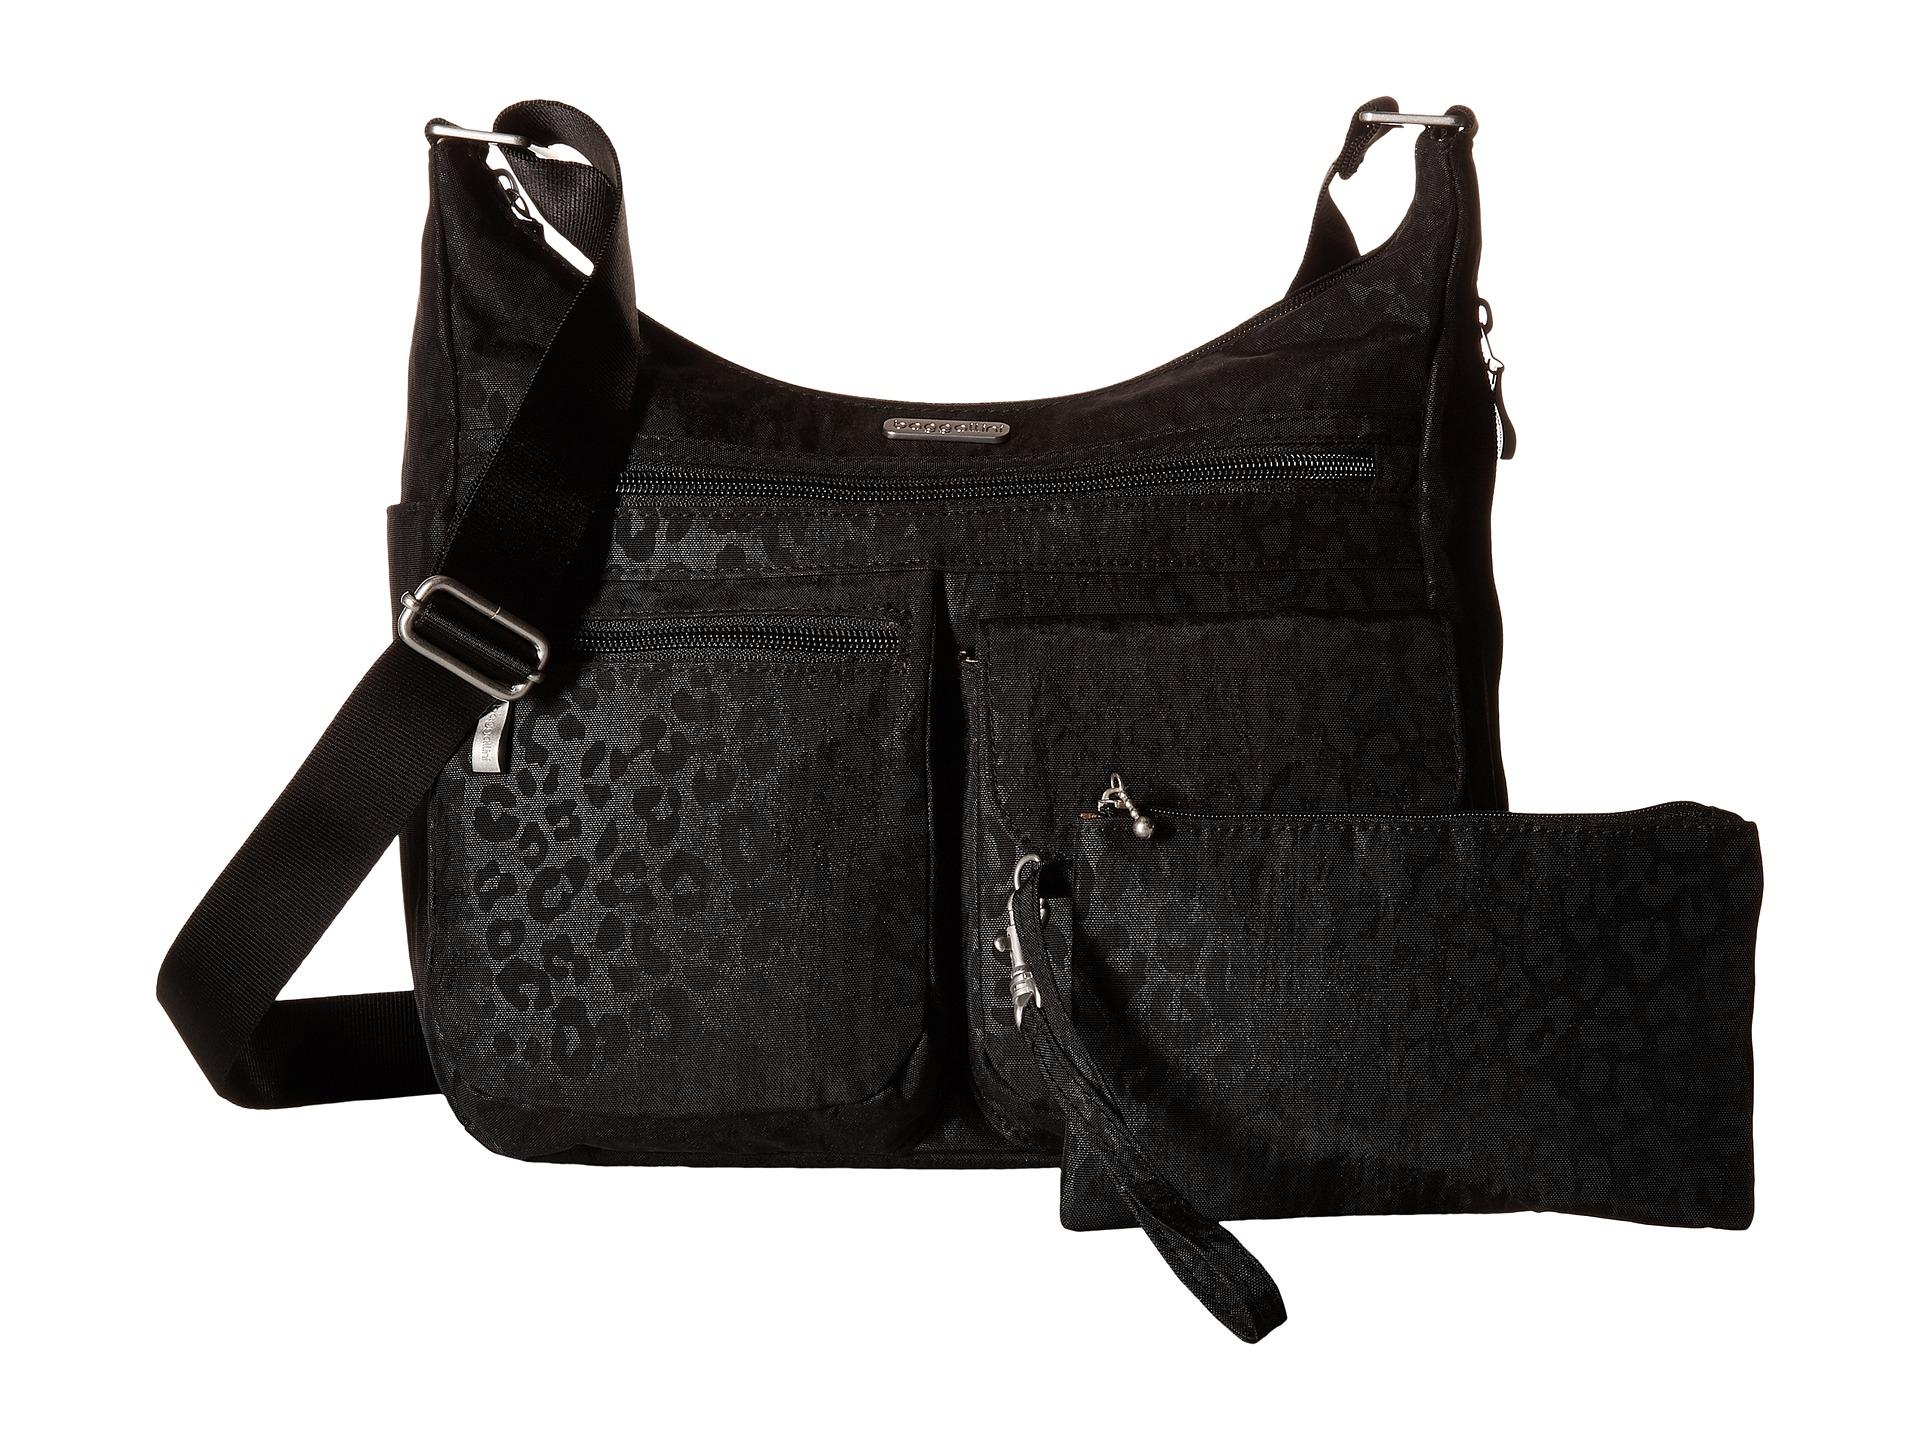 Baggallini Everywhere Bag Cheetah Black Free Shipping Both Ways